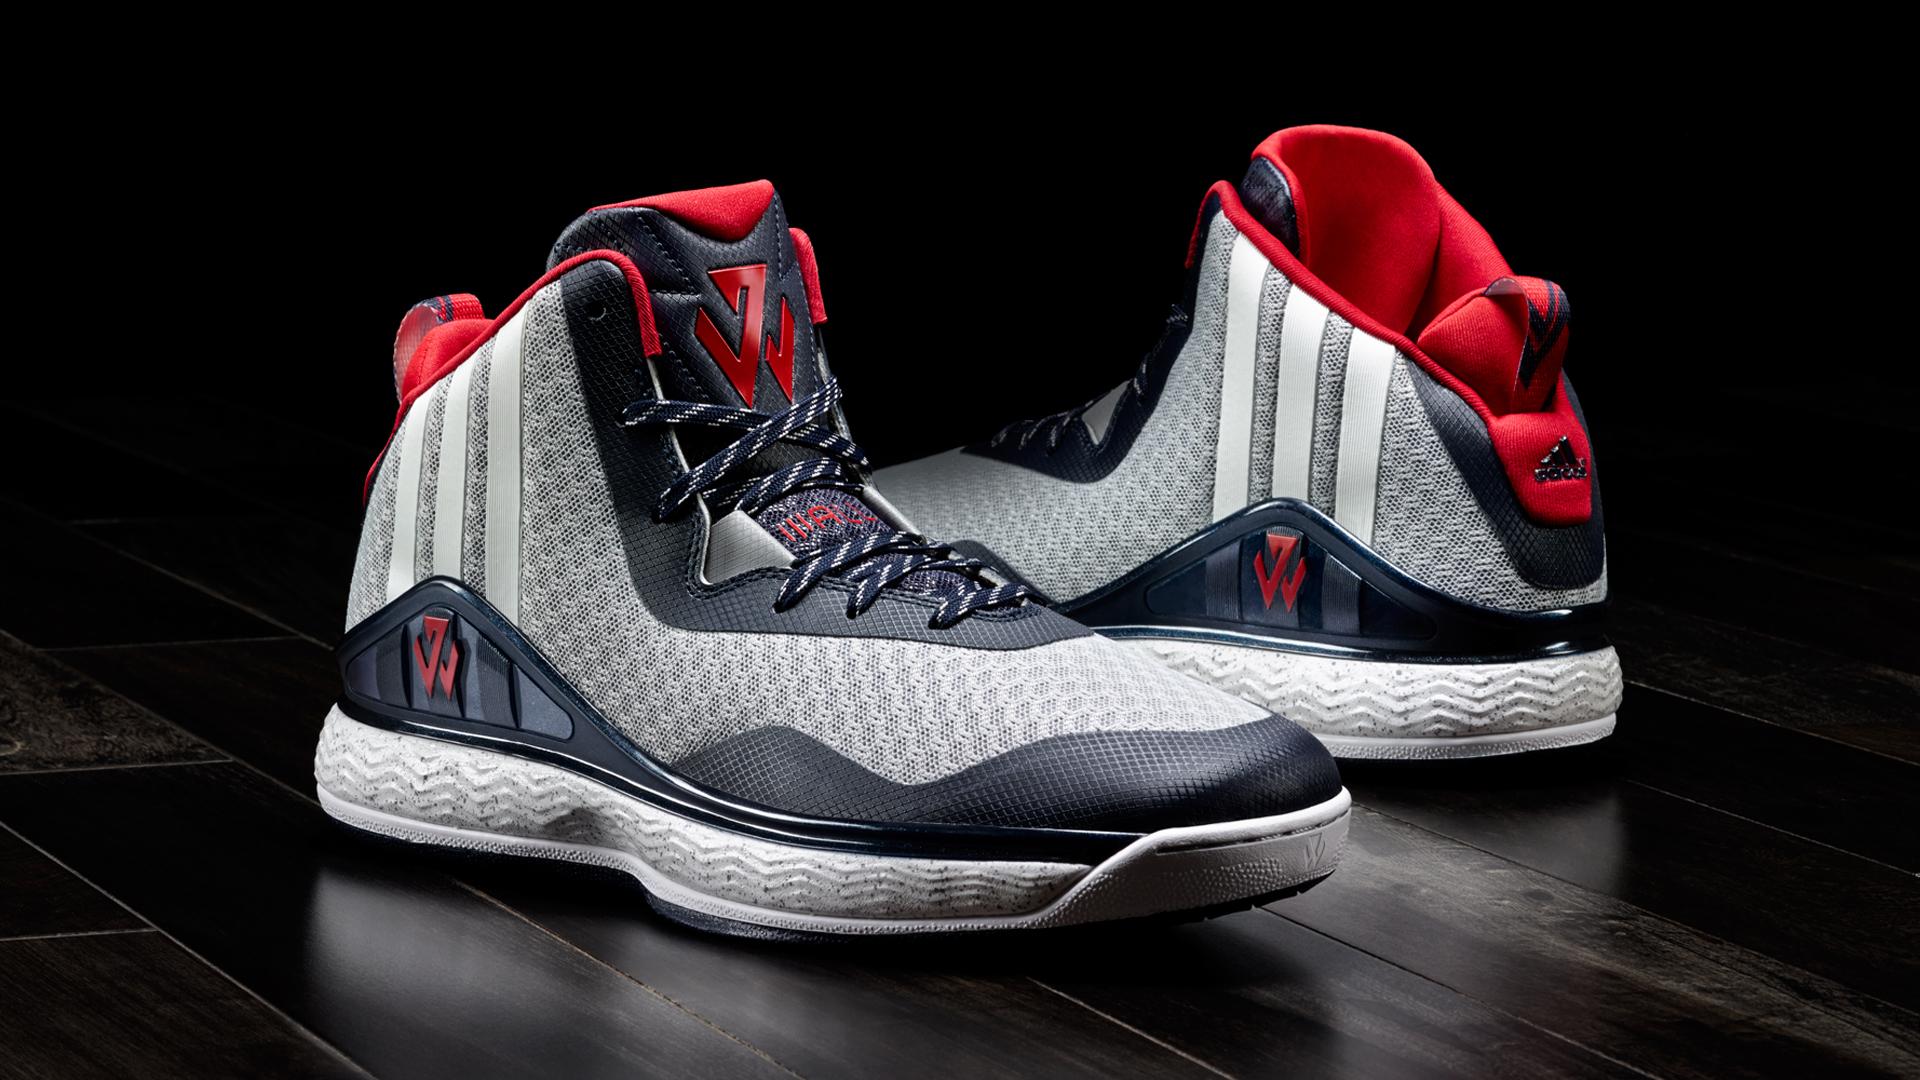 John-Wall-Shoe-092914-FTR-adidas.jpg